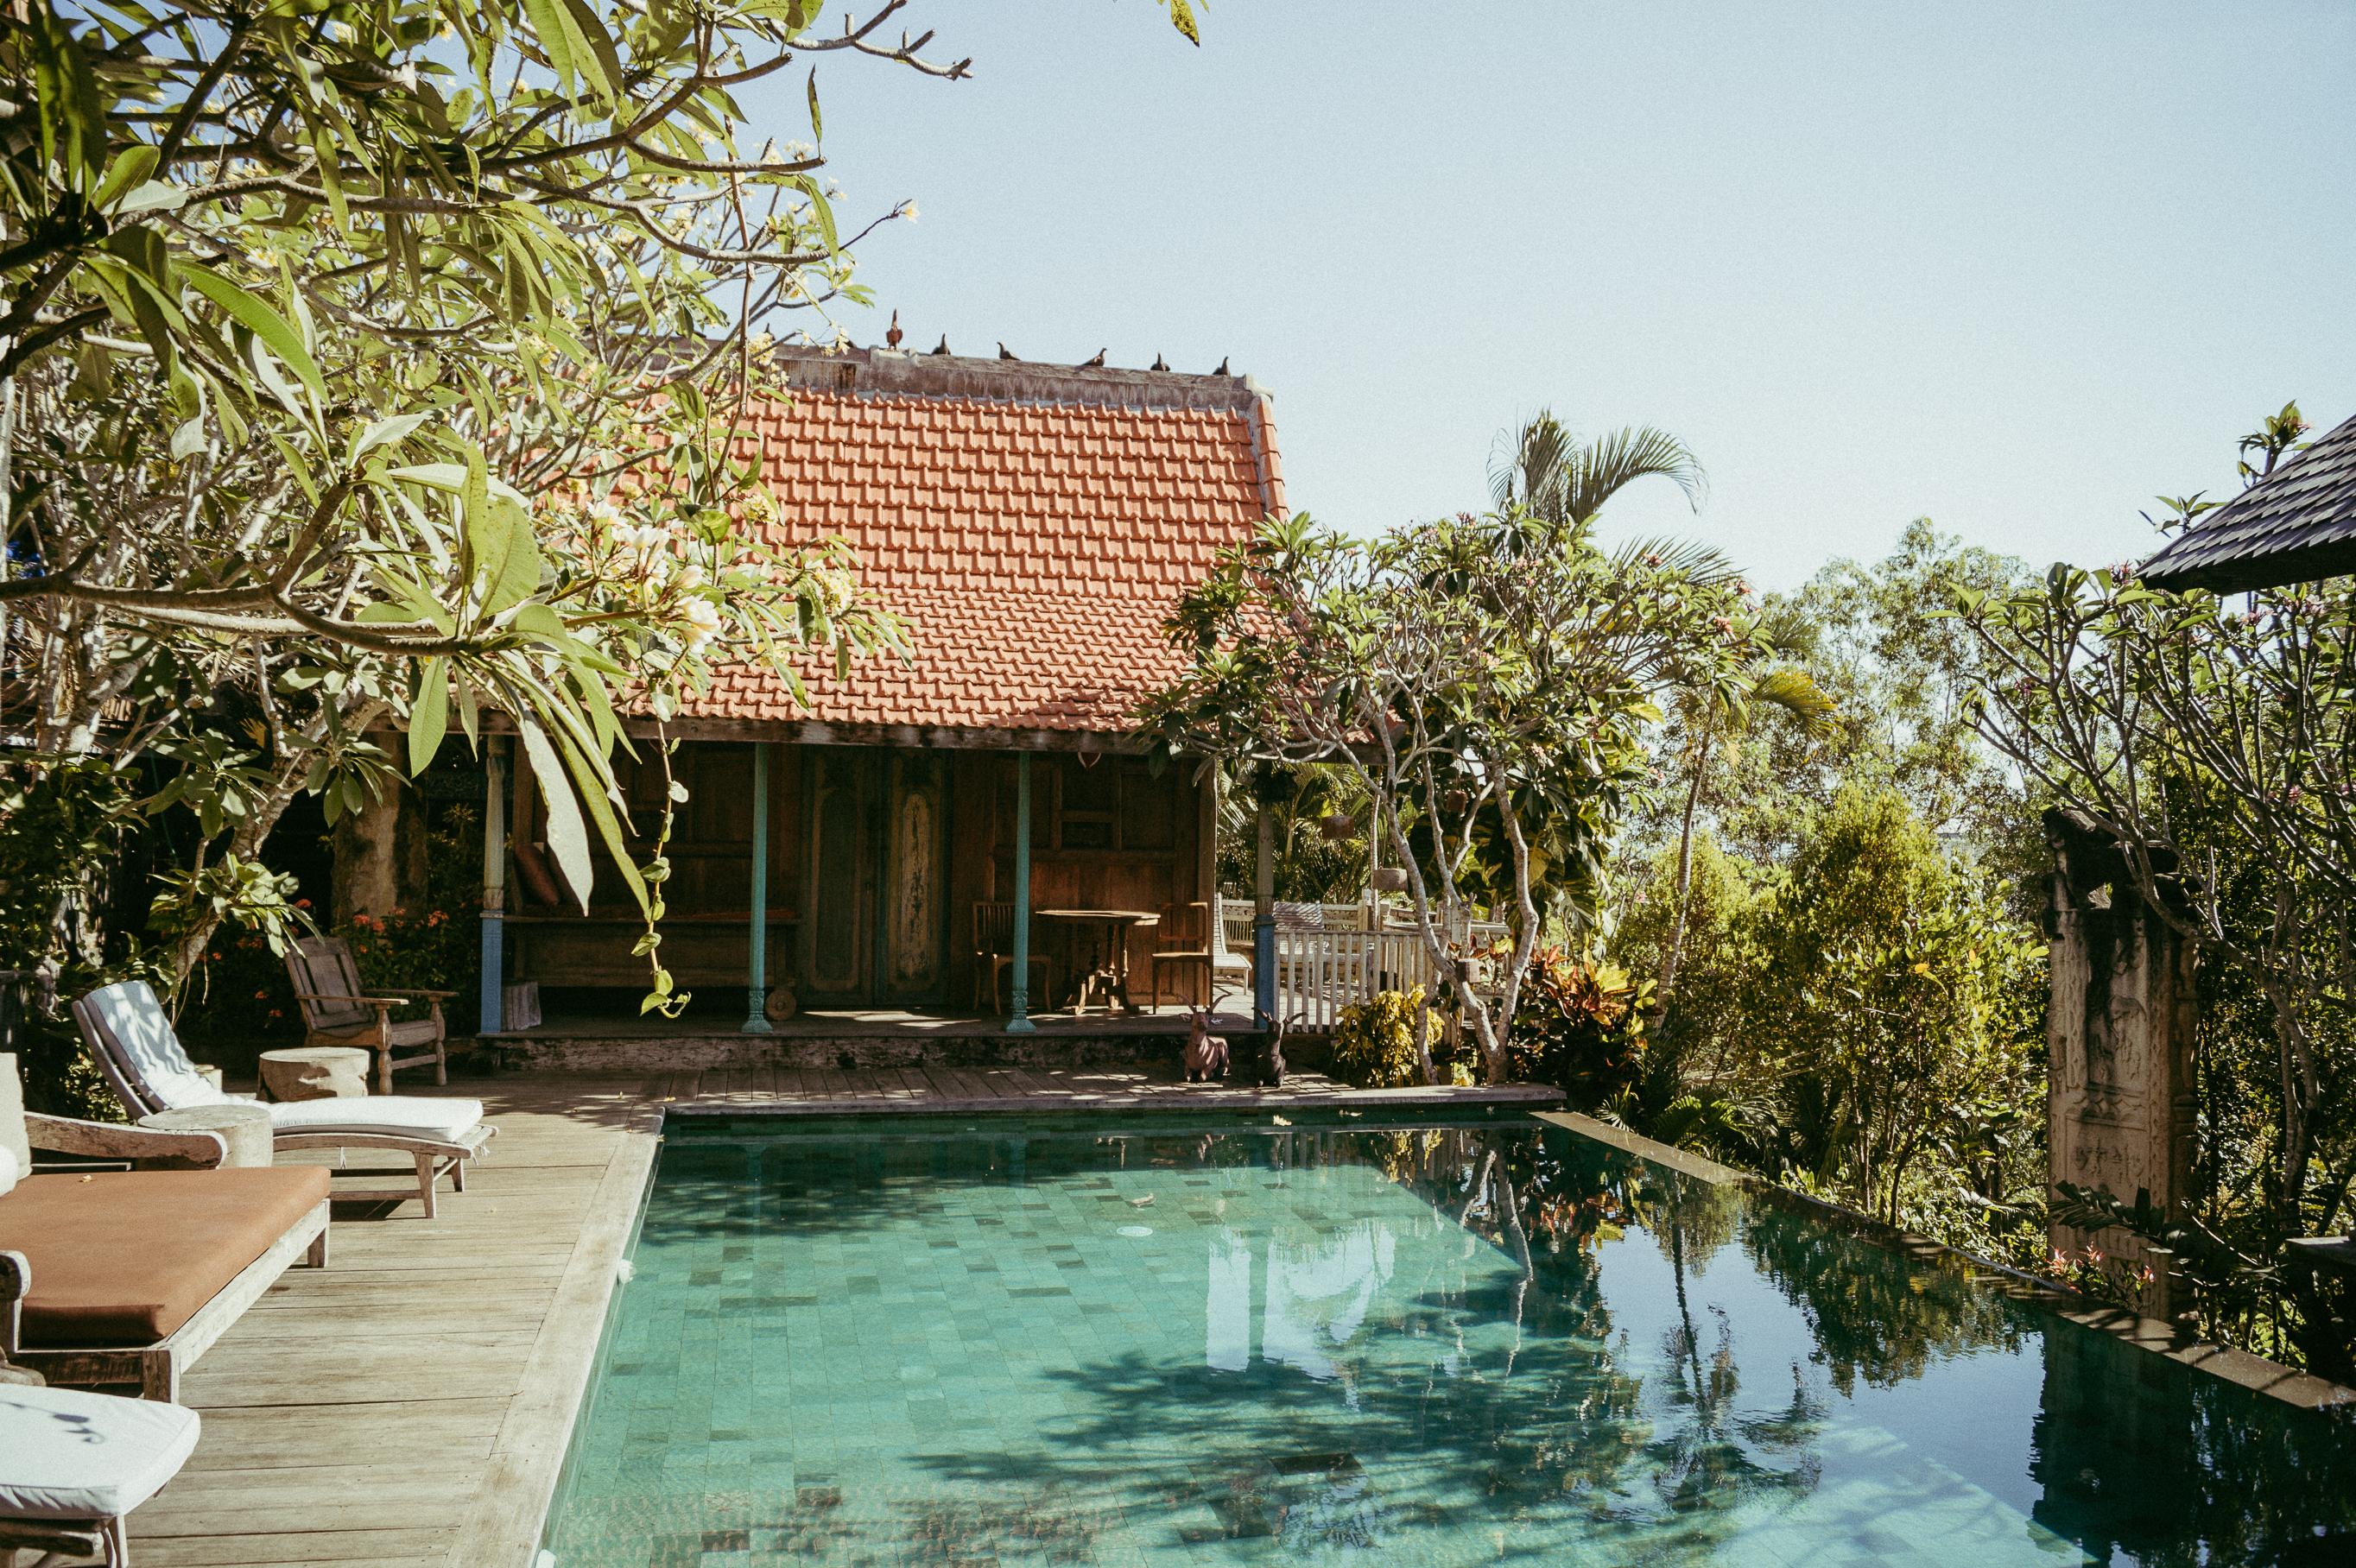 Villa Uma Priyayi Bali Travel Review Sariety Reiseblog Travel Recap Reisebericht Sarah Schäfer Flitterwochen Bali Hotel Review Honeymoon Uluwatu_3